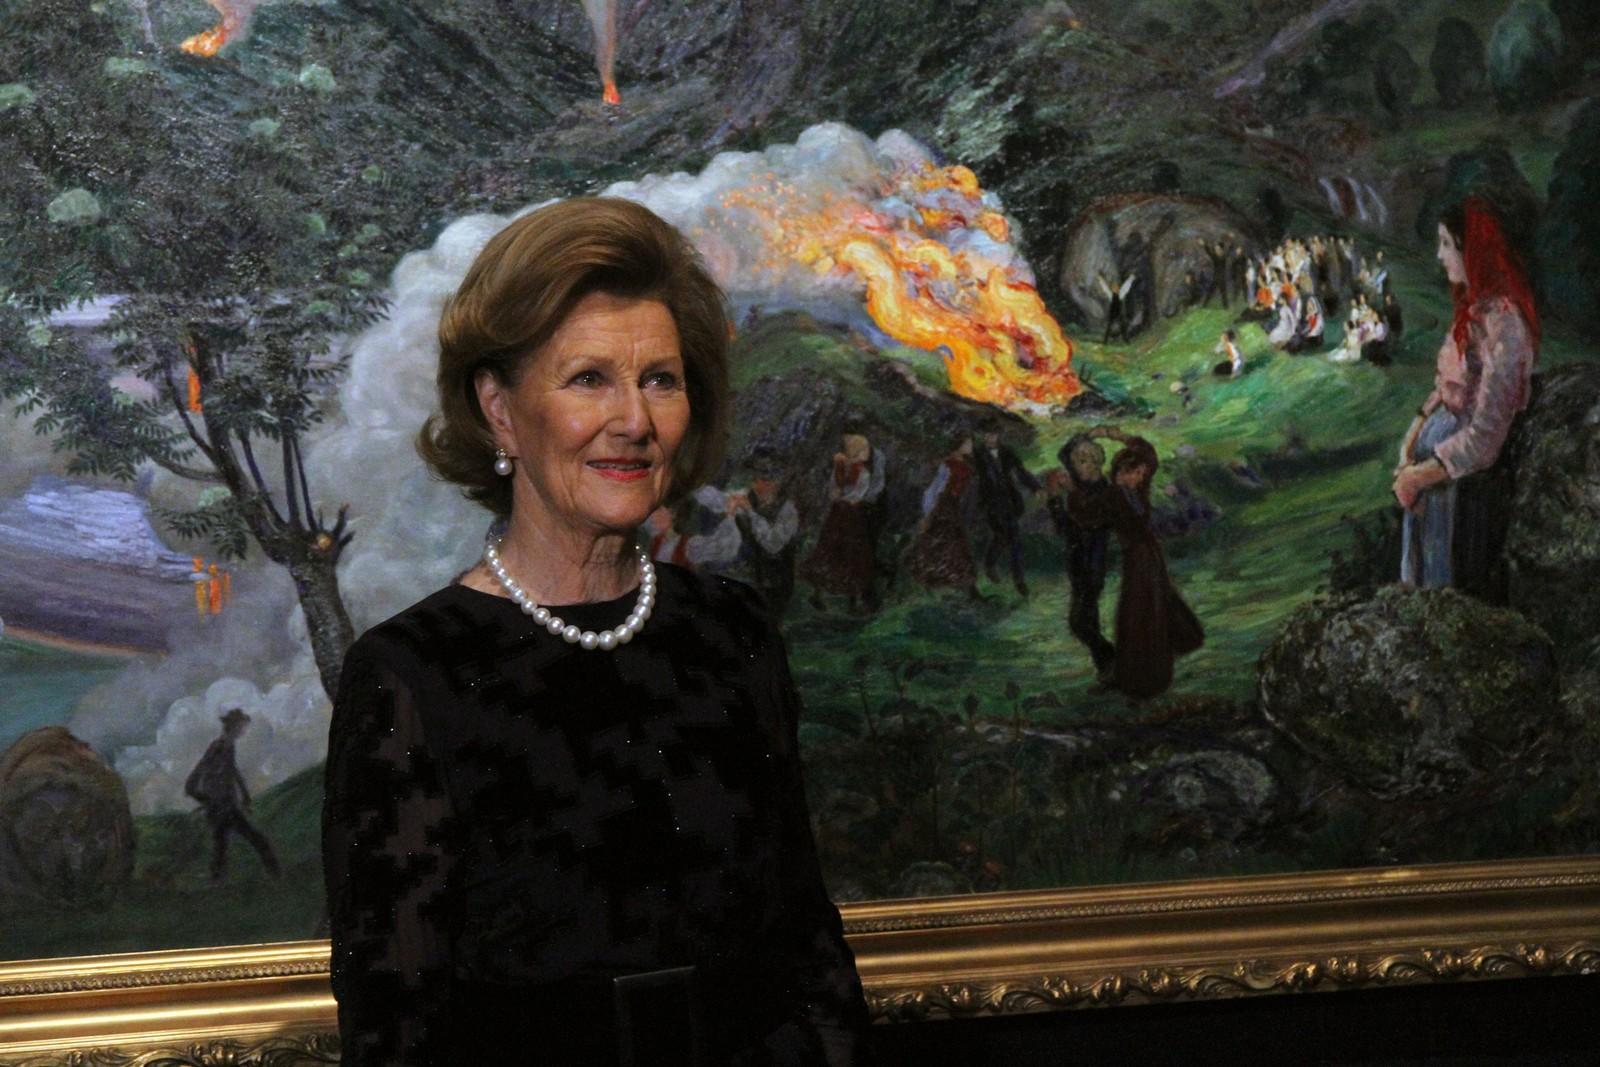 Dronning Sonja tok seg god tid på omvisninga.